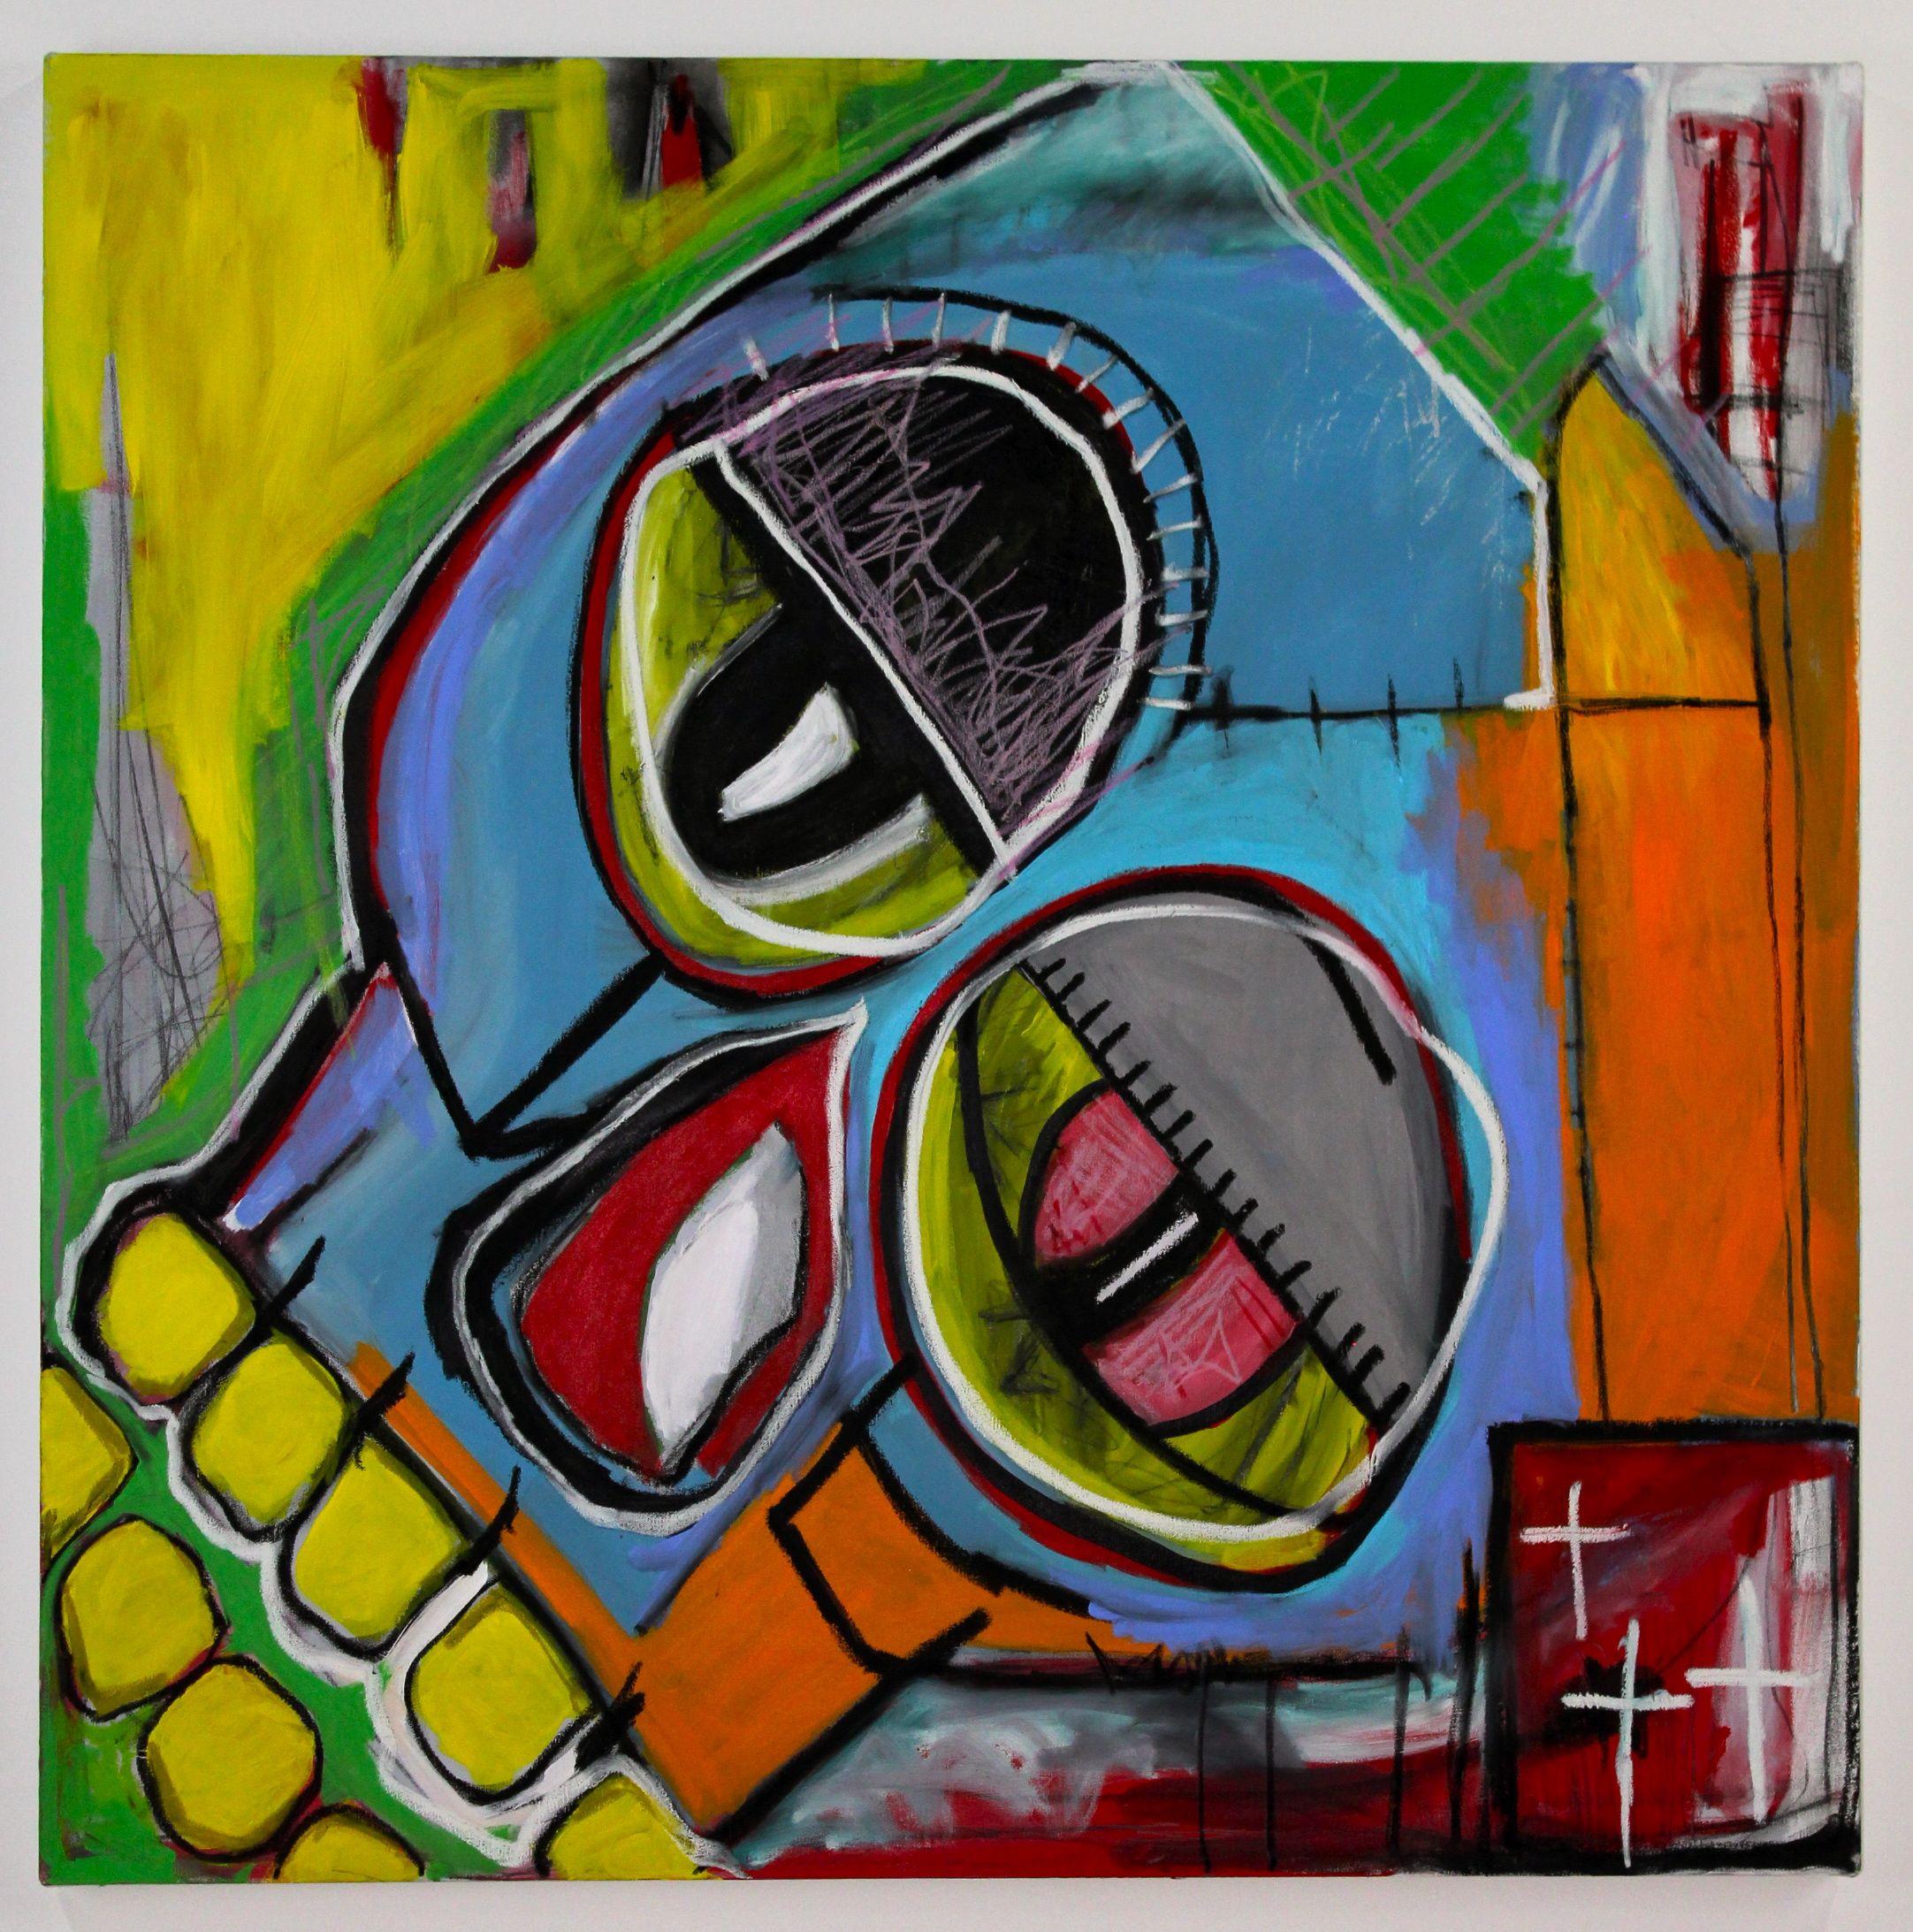 Untitled (Head) 2012